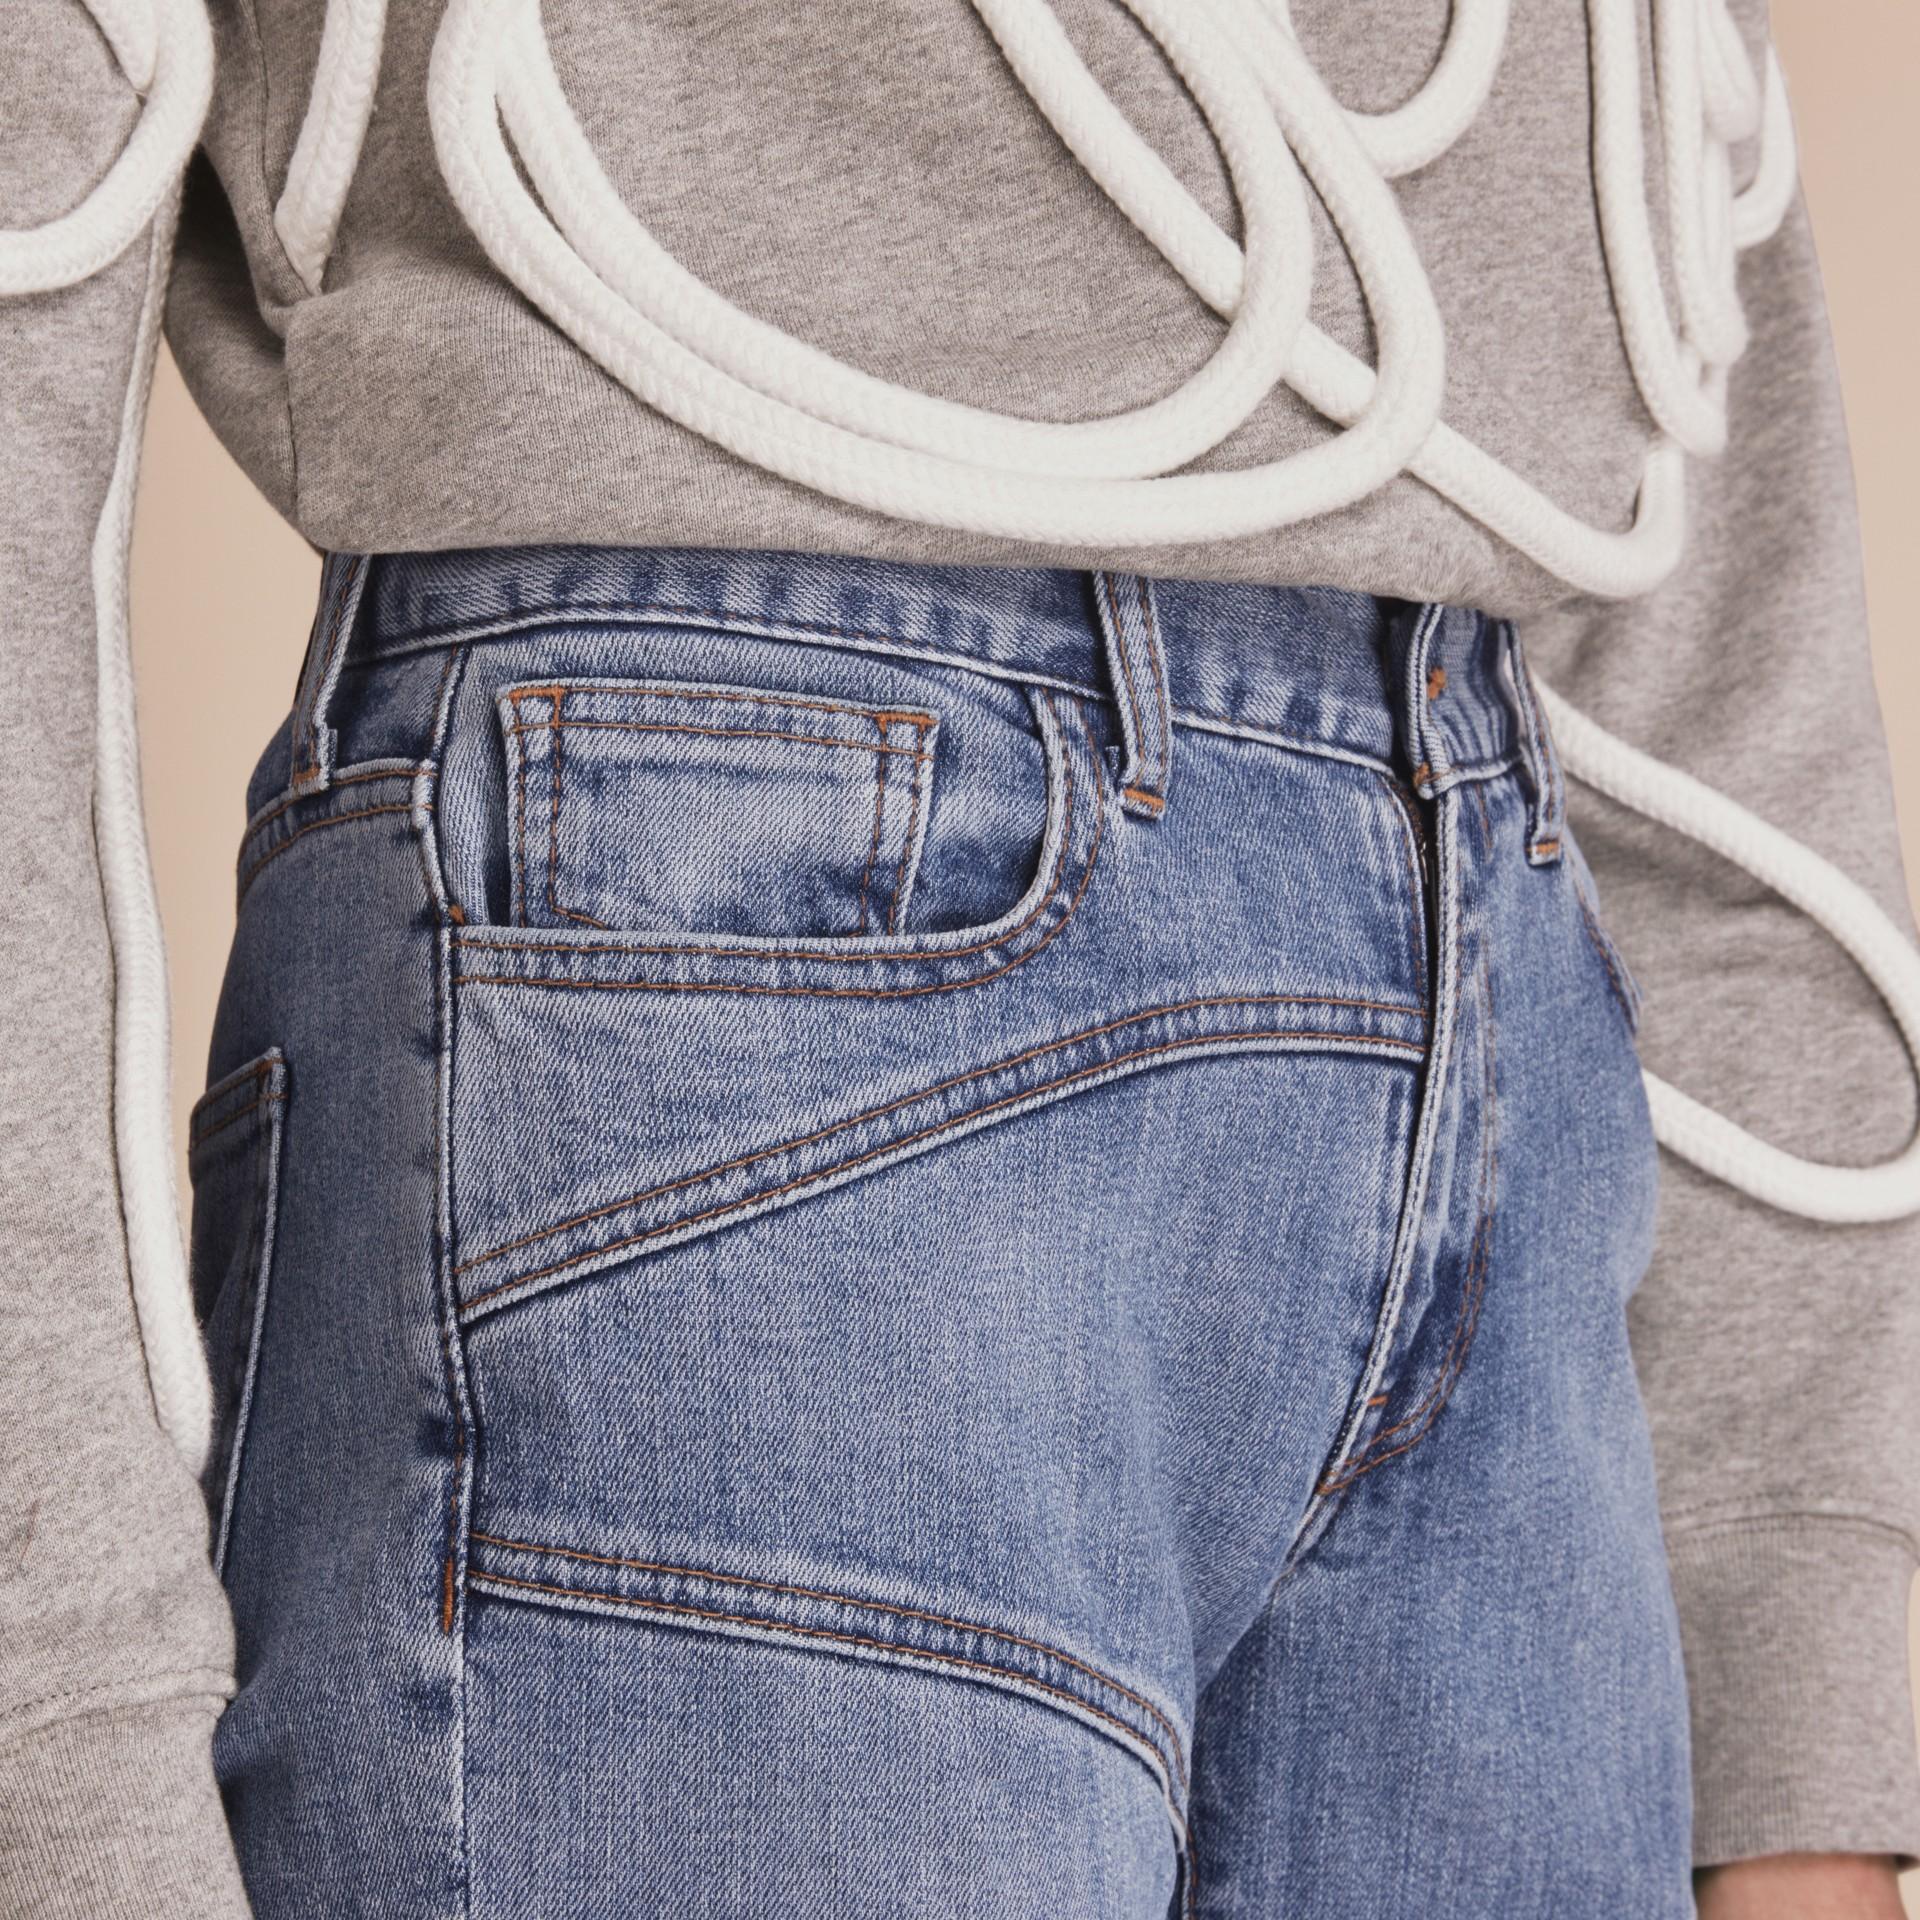 Slim Fit Seam Detail Japanese Denim Jeans - gallery image 5